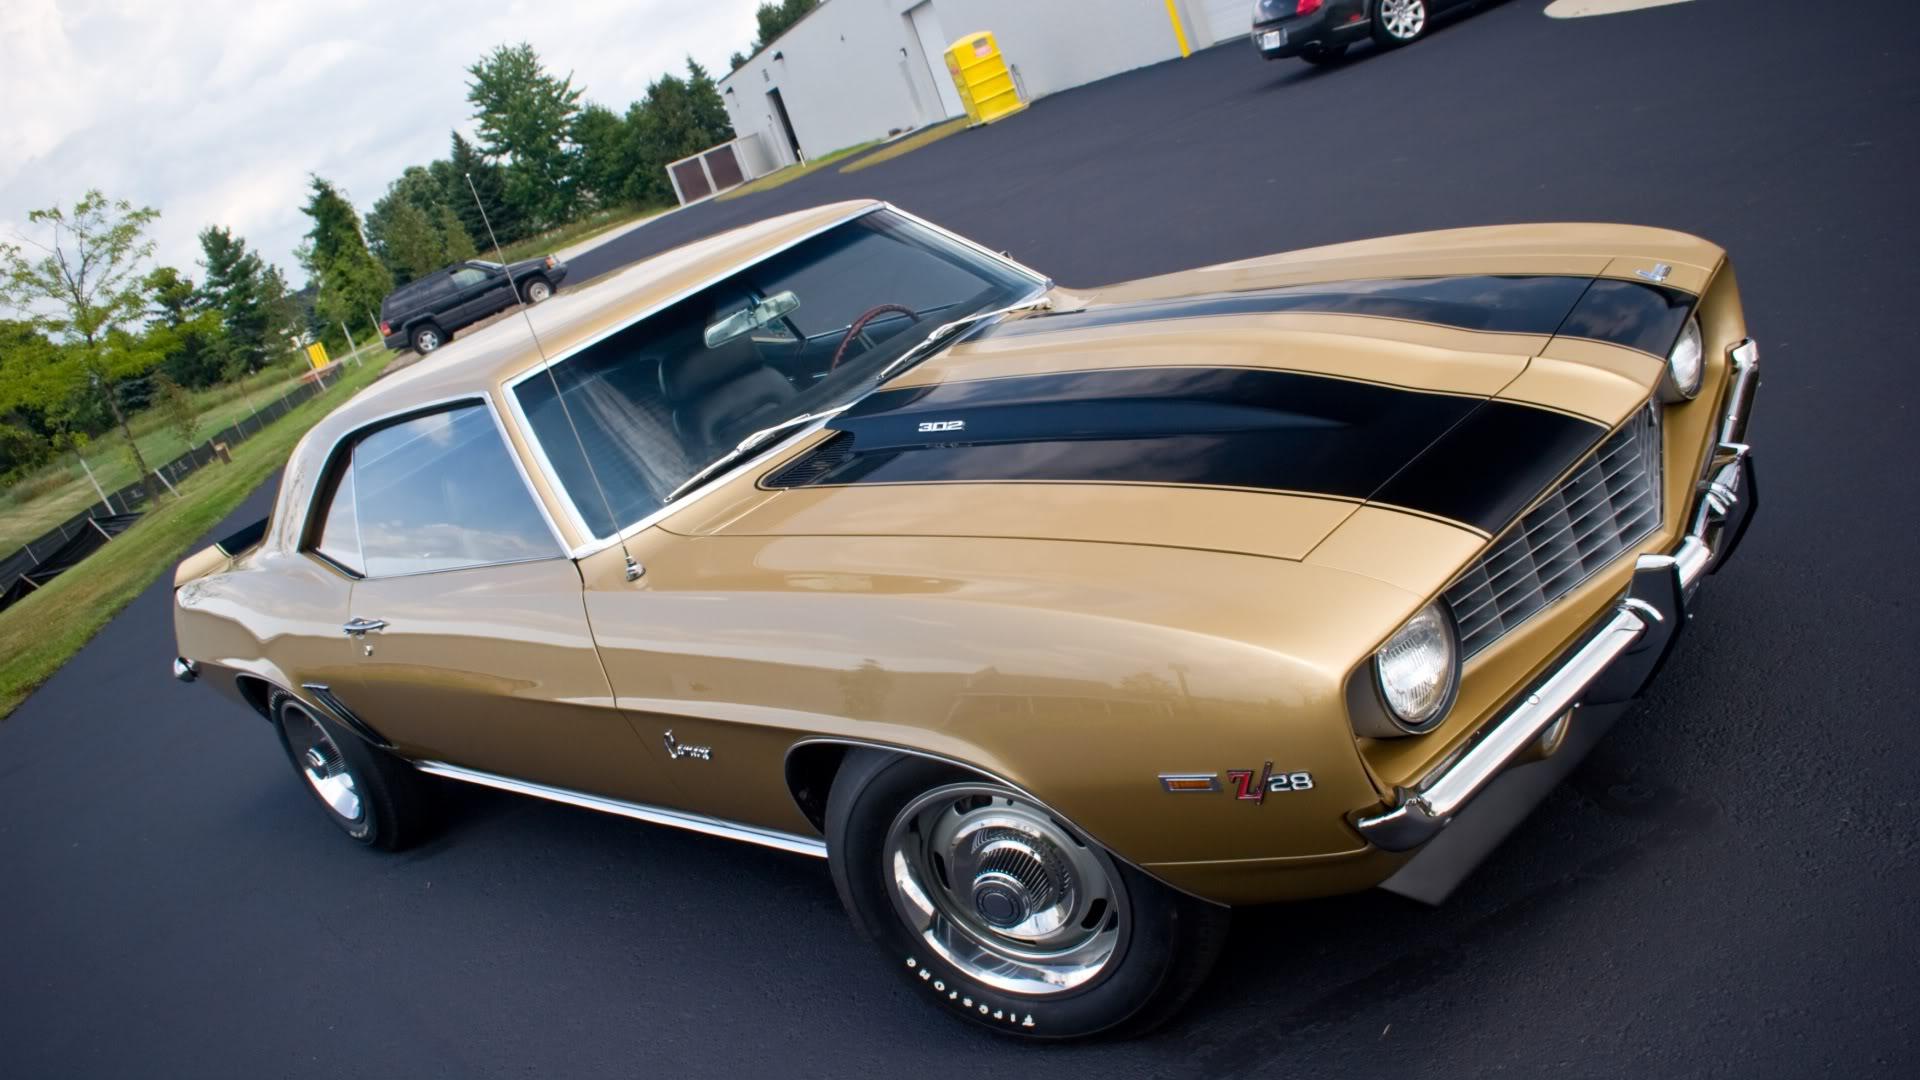 1969 Camaro 302 Z28 wallpaper 1920x1080 36949 WallpaperUP 1920x1080